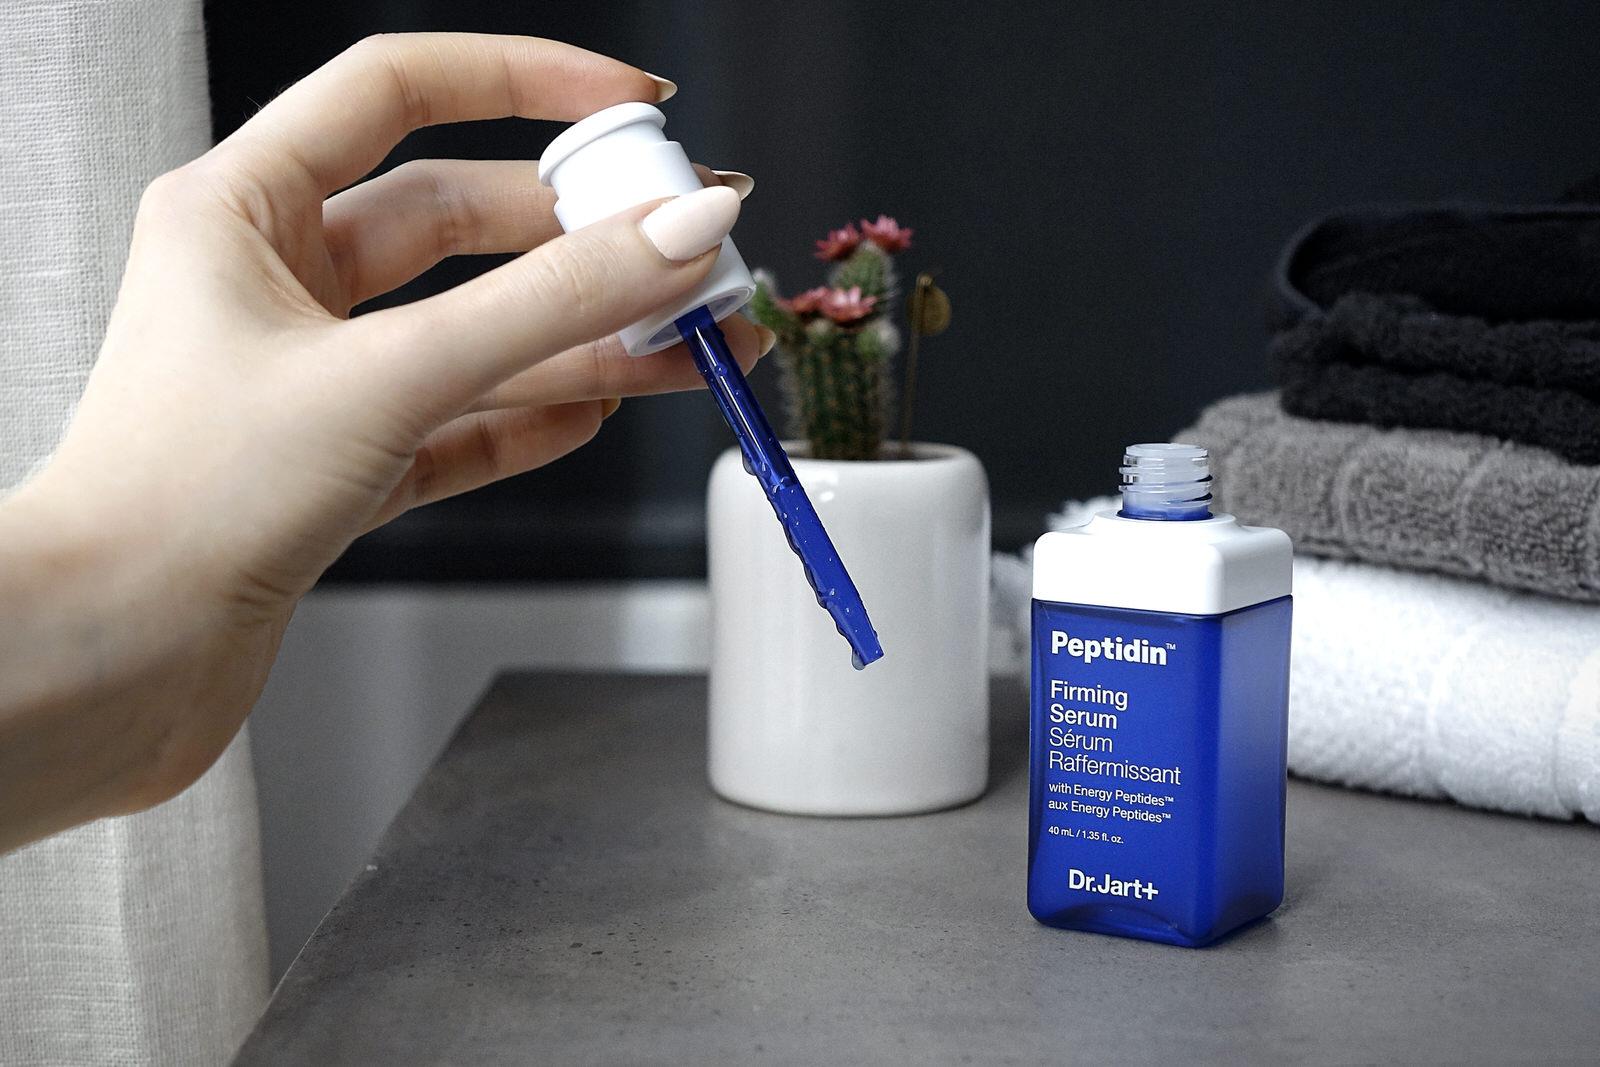 Les 2 sérums du Dr Jart+ Peptidin, firming serum et radiance serum